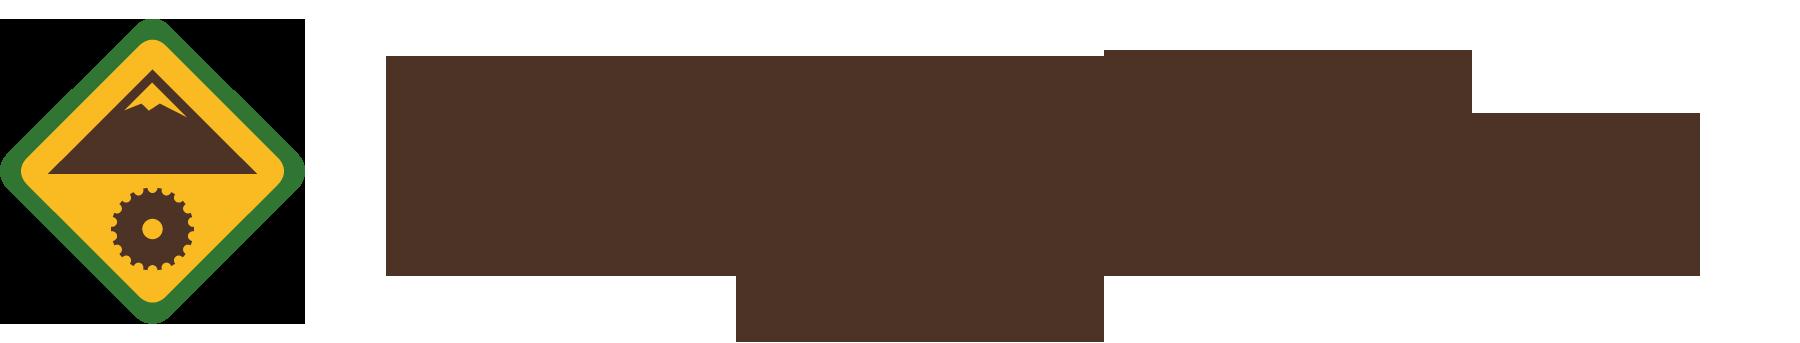 bannerlogon